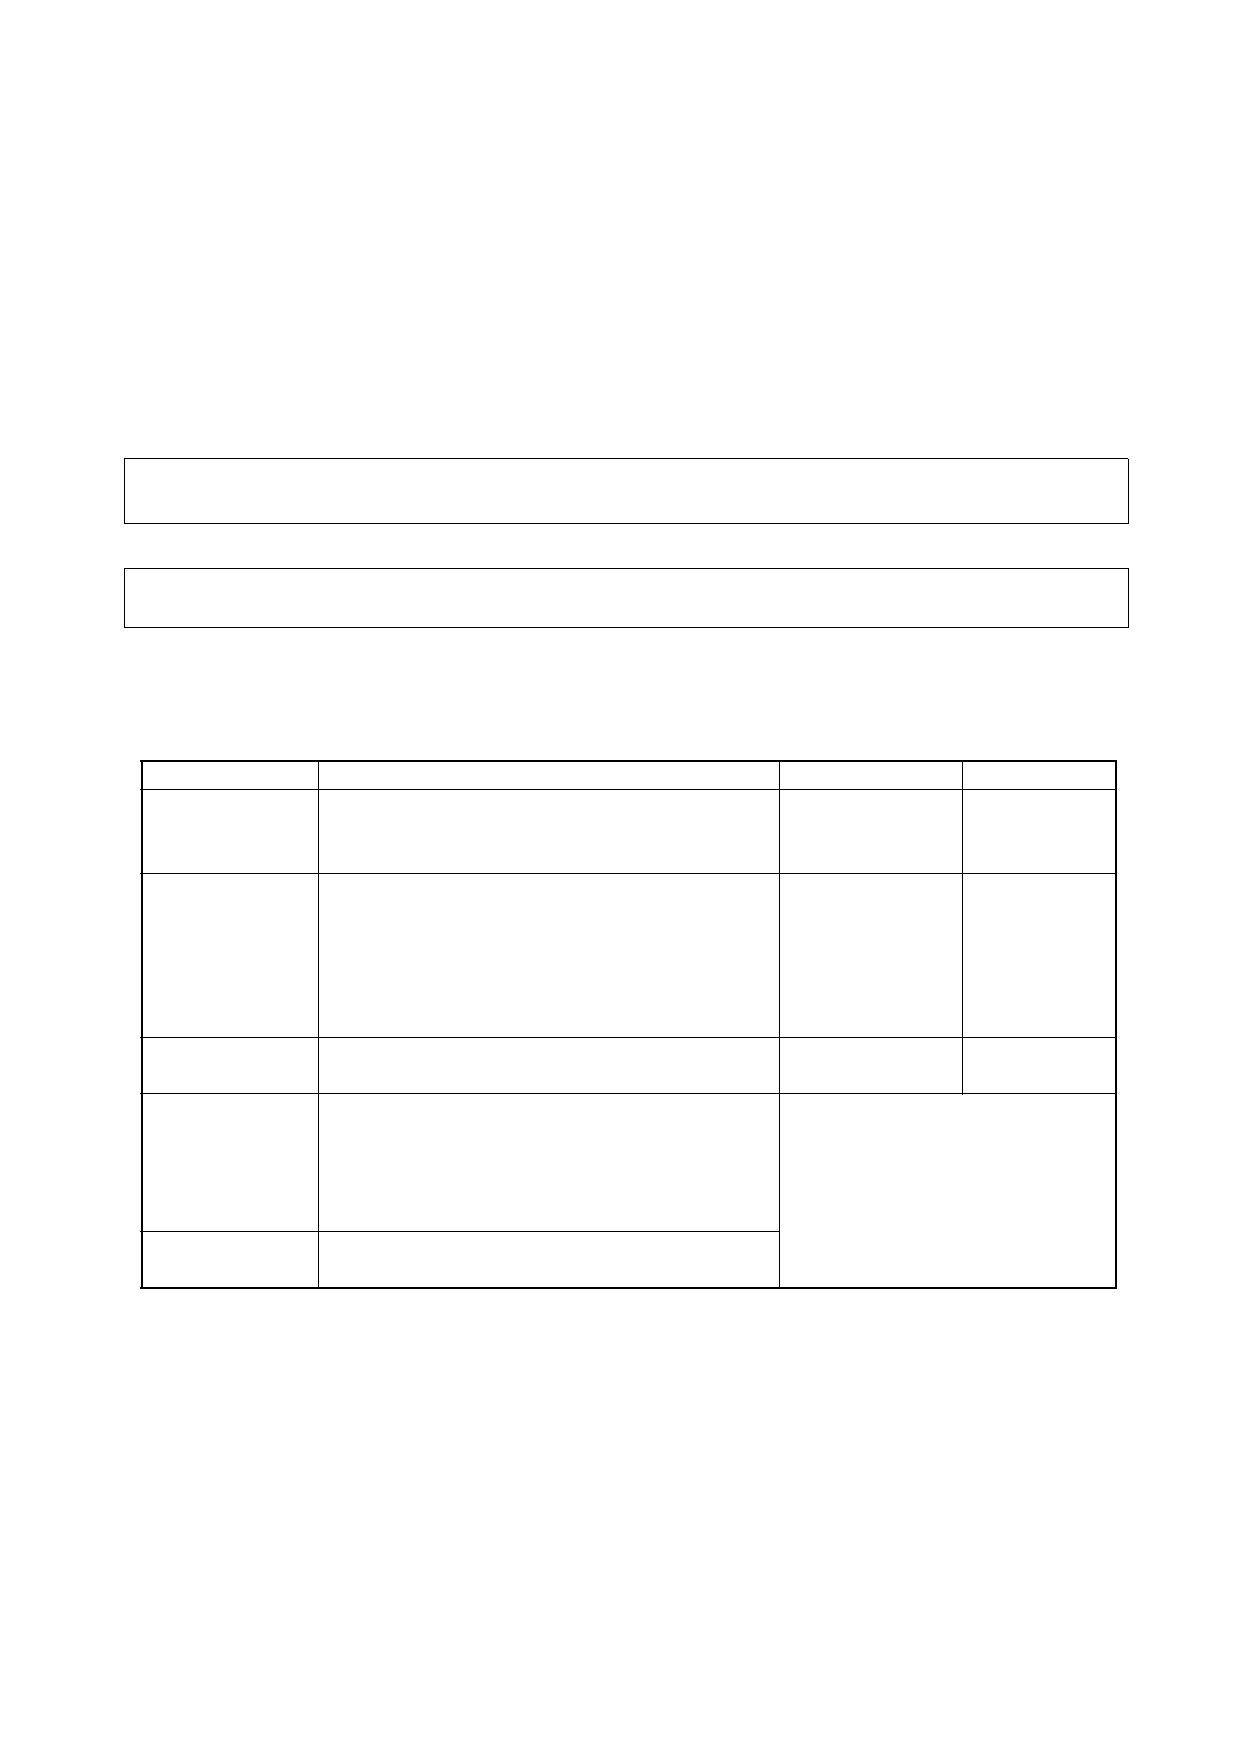 R5F21216KFP pdf, 반도체, 판매, 대치품